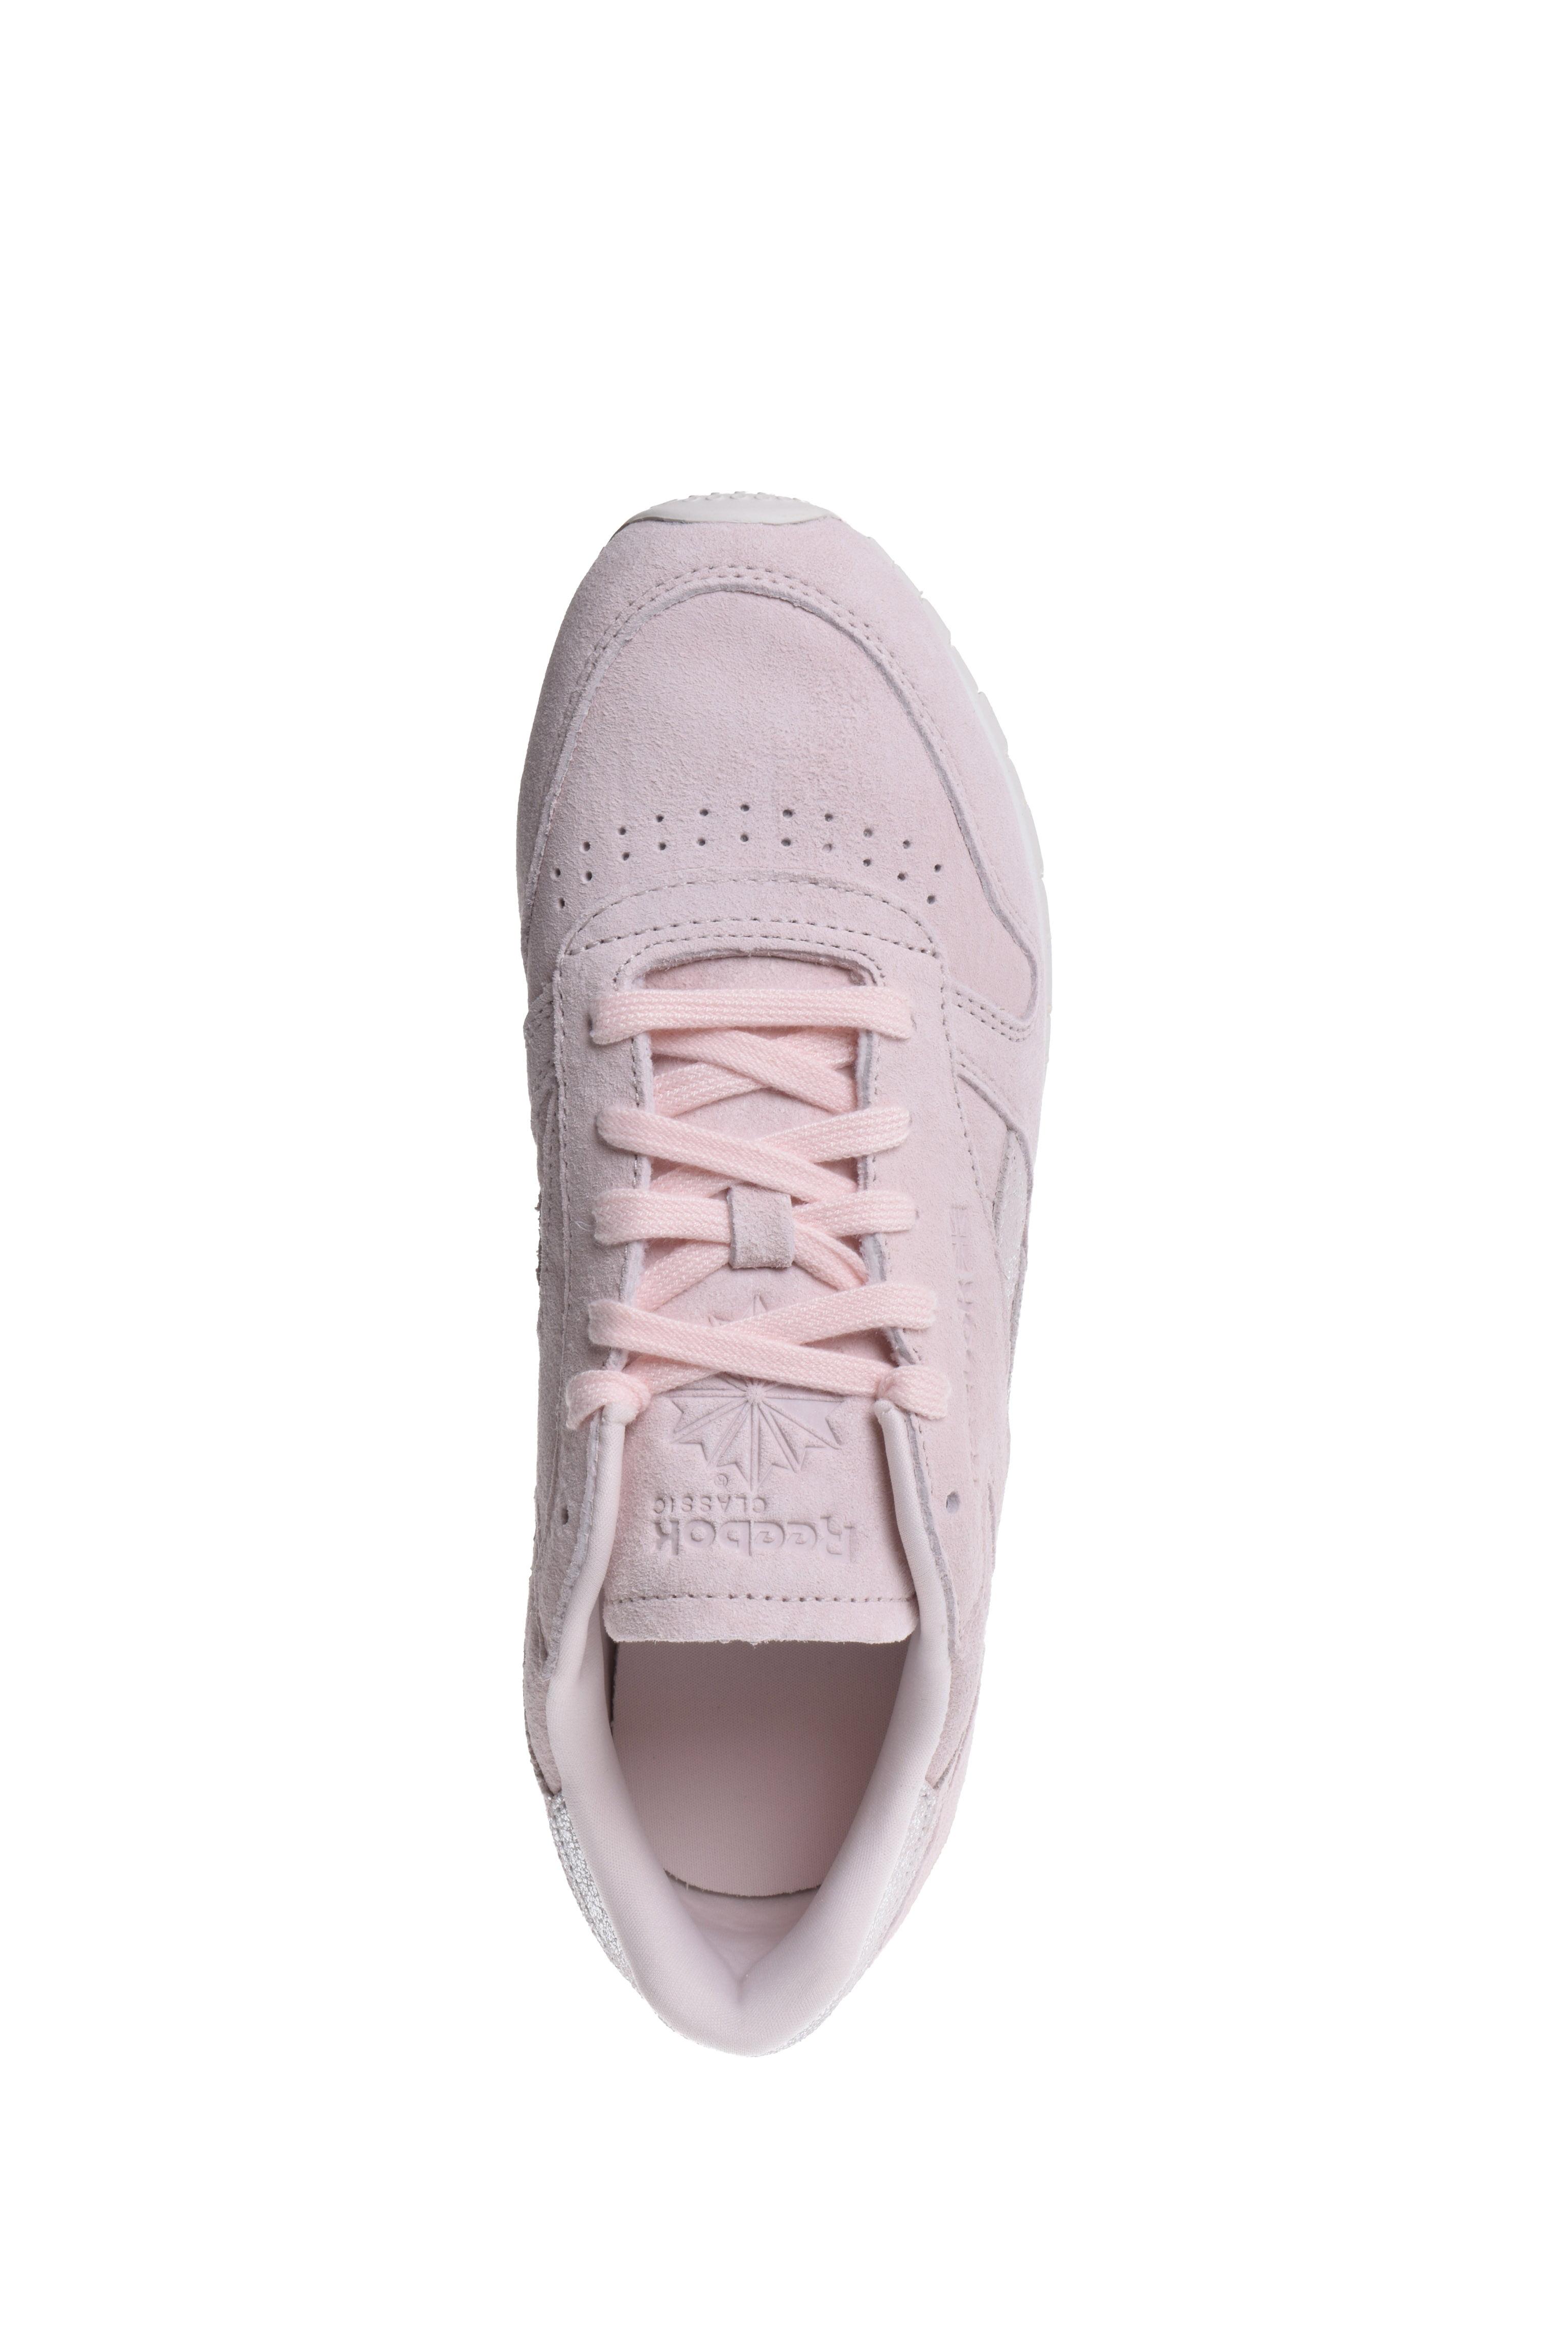 b3b8d025895 Reebok - Reebok Classic Leather Shimmer Pale Pink Chalk Women s Running  Shoes BS9865 - Walmart.com